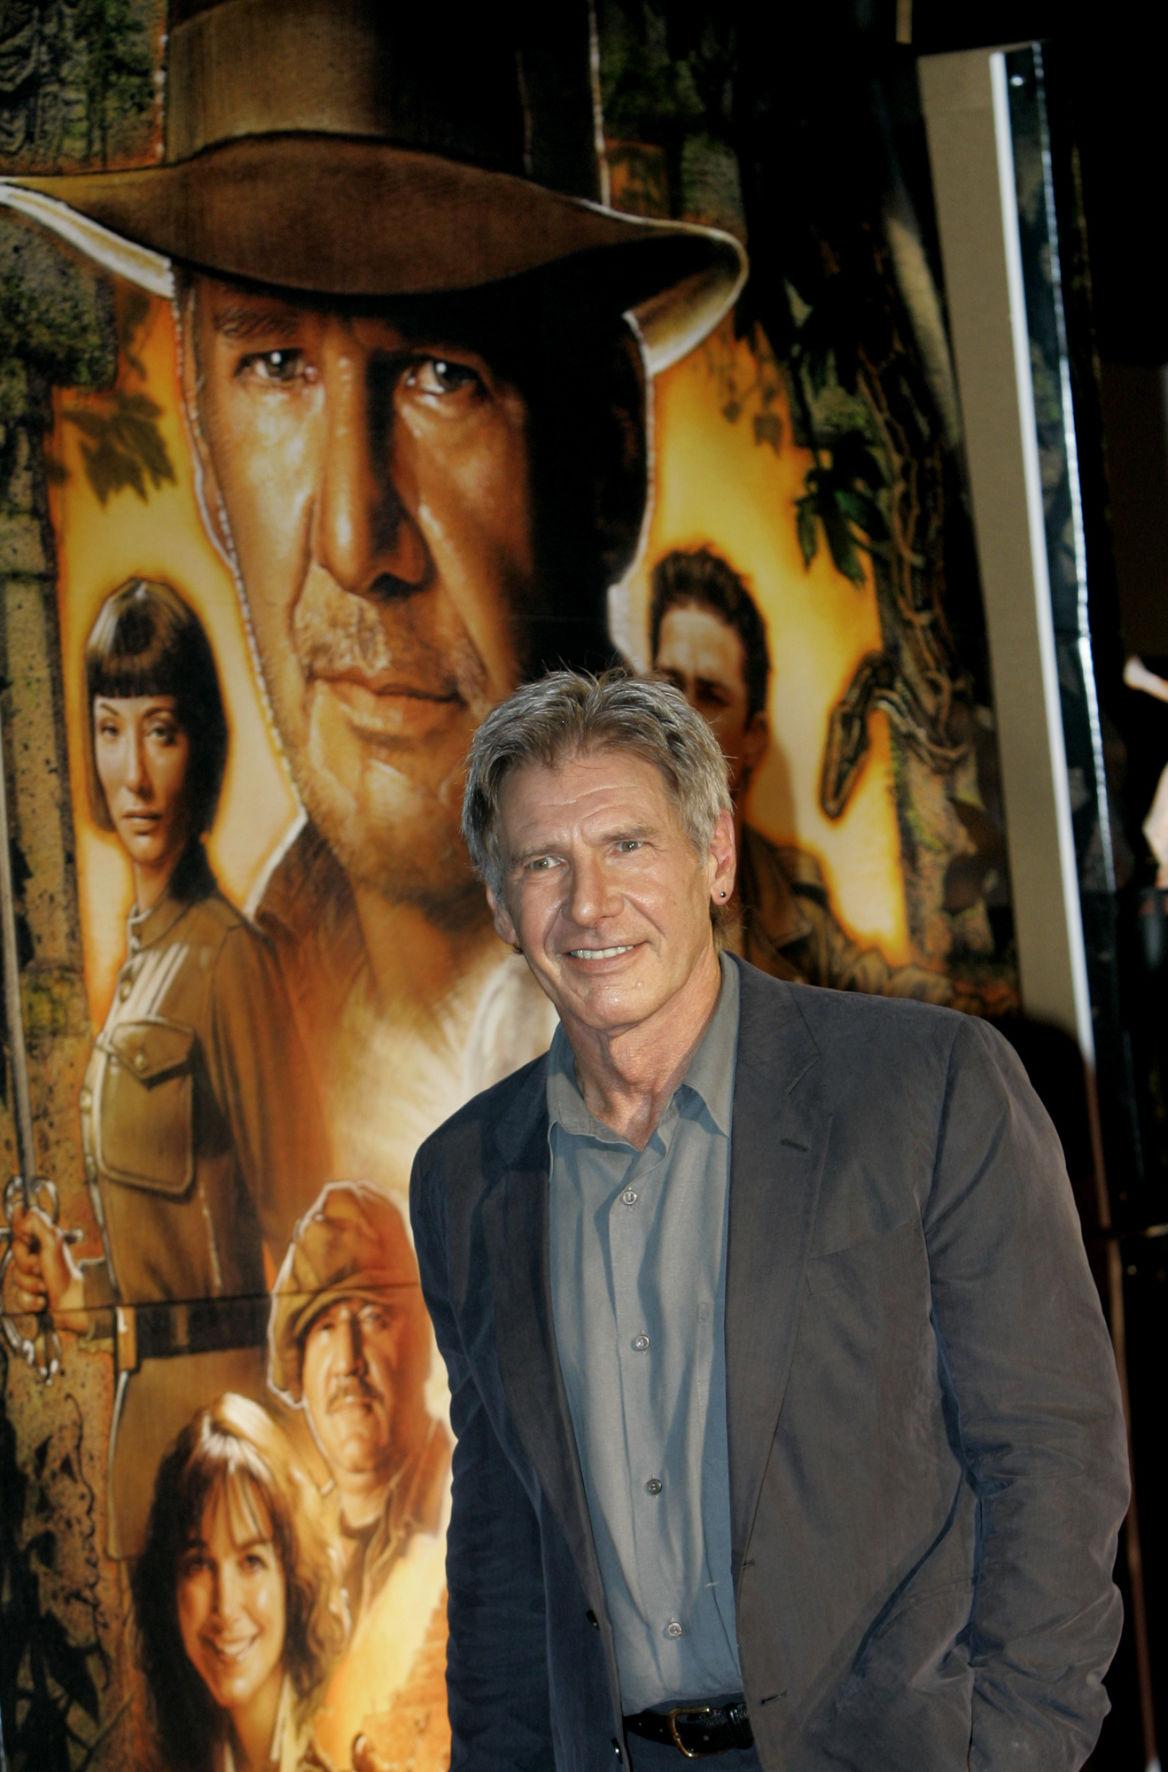 Update 2) Harrison Ford crash lands vintage plane on golf course | News |  cullmantimes.com